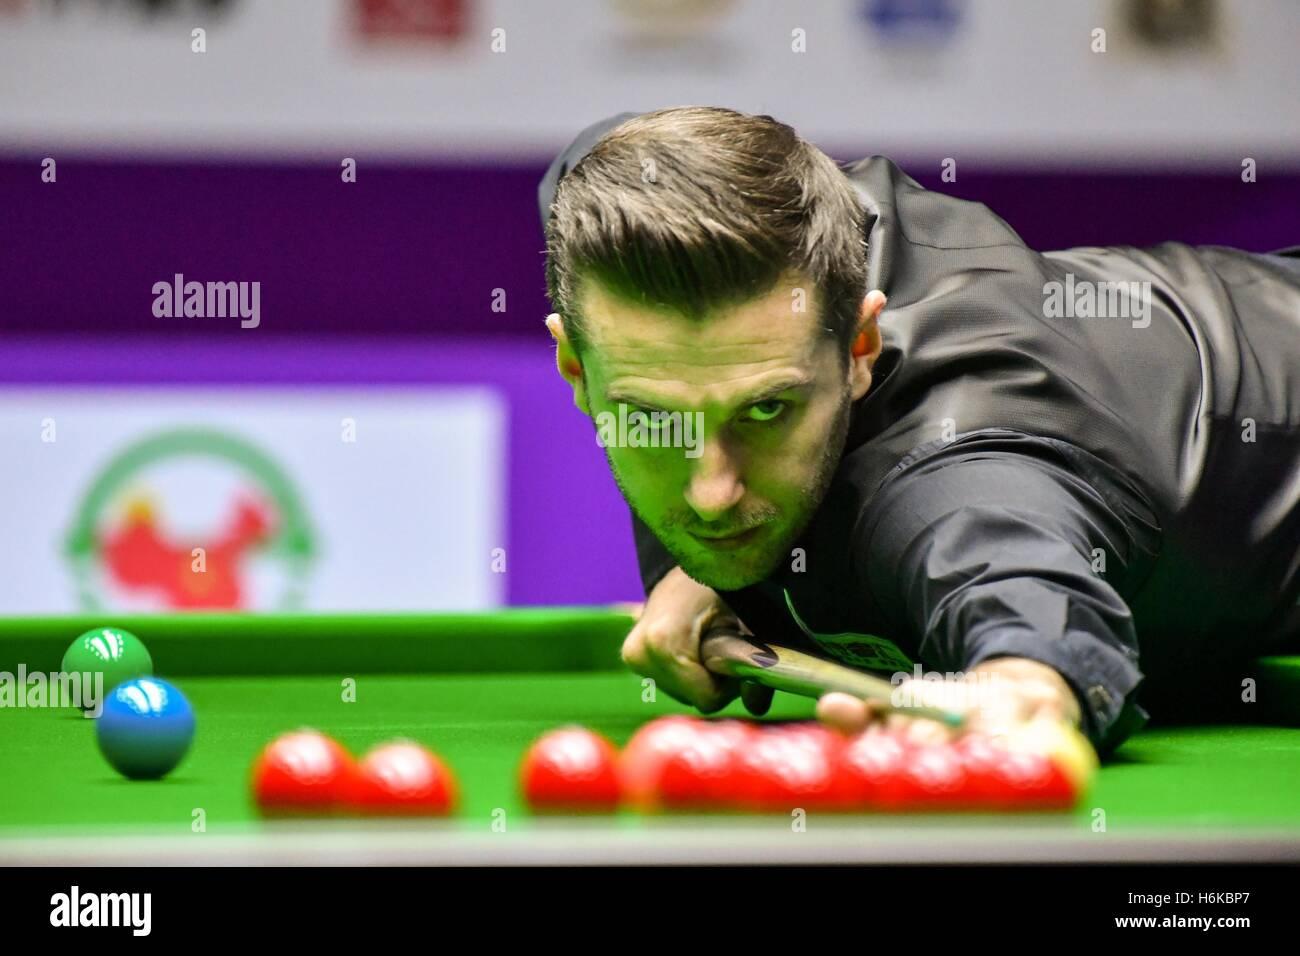 China de Daqing, provincia de Heilongjiang. 30 Oct, 2016. Mark Selby de Inglaterra compite durante el último Imagen De Stock